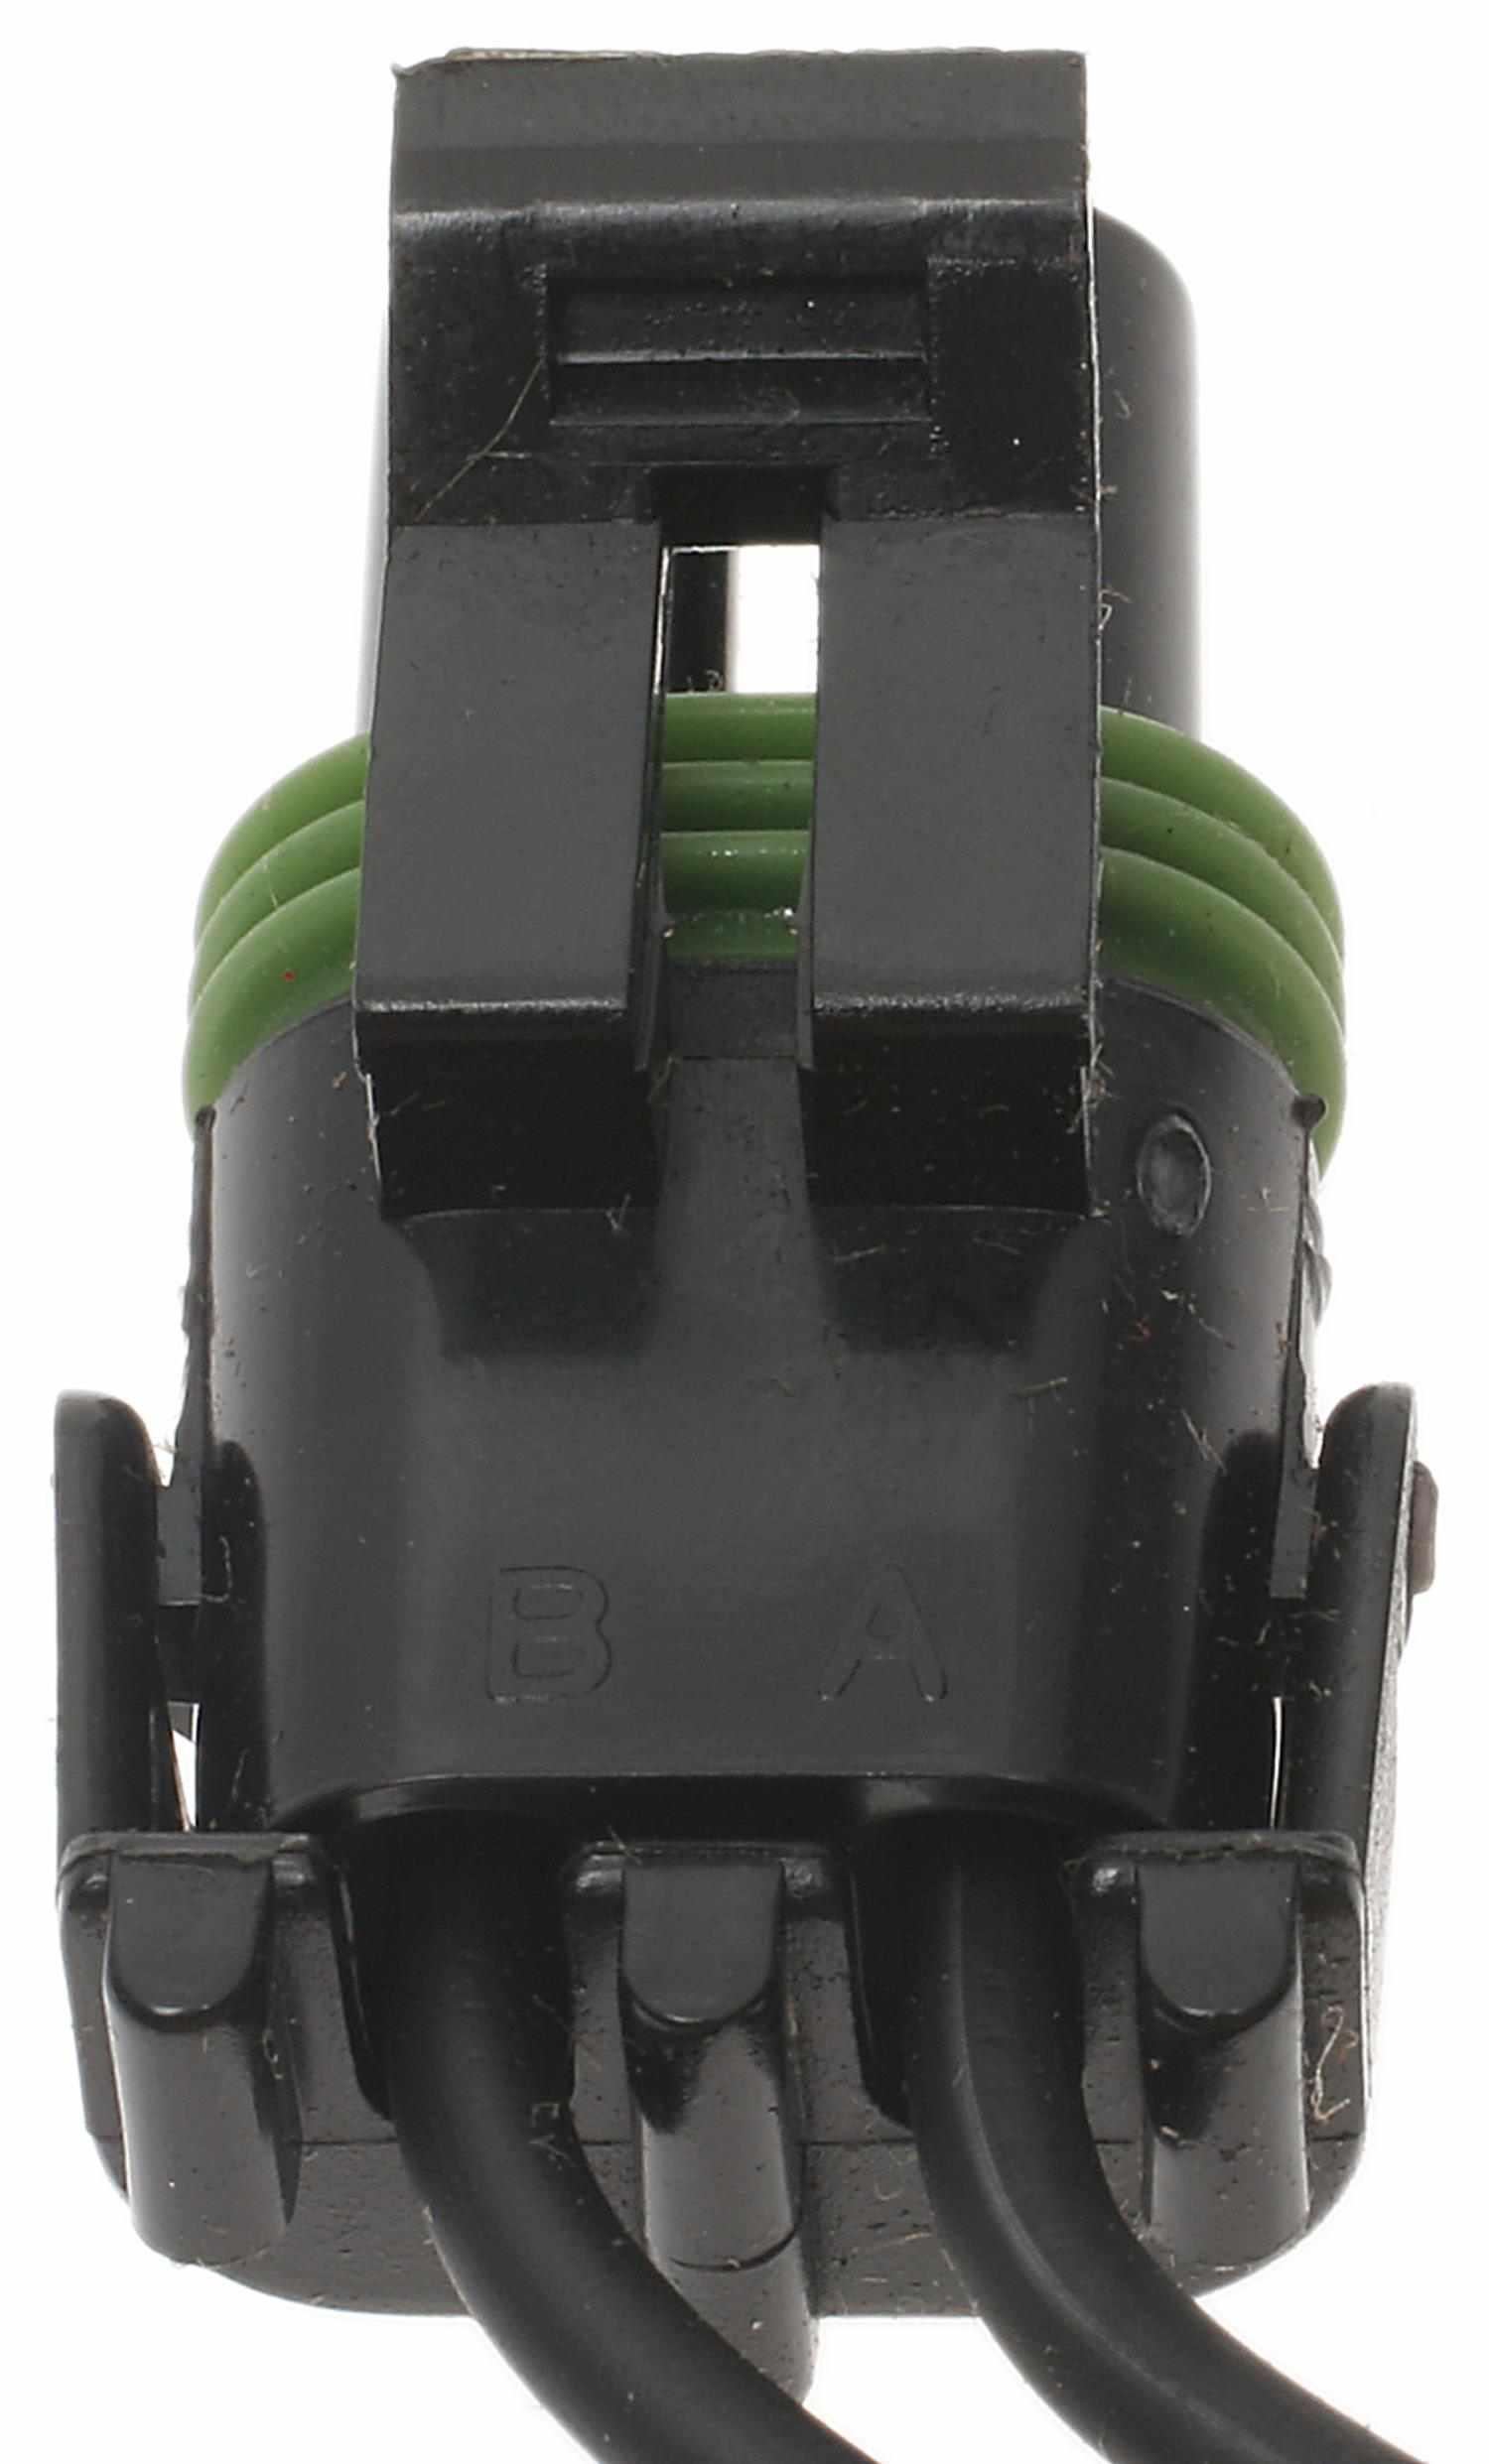 White Shift Pattern 51n American Shifter 77950 Black Metal Flake Shift Knob with M16 x 1.5 Insert